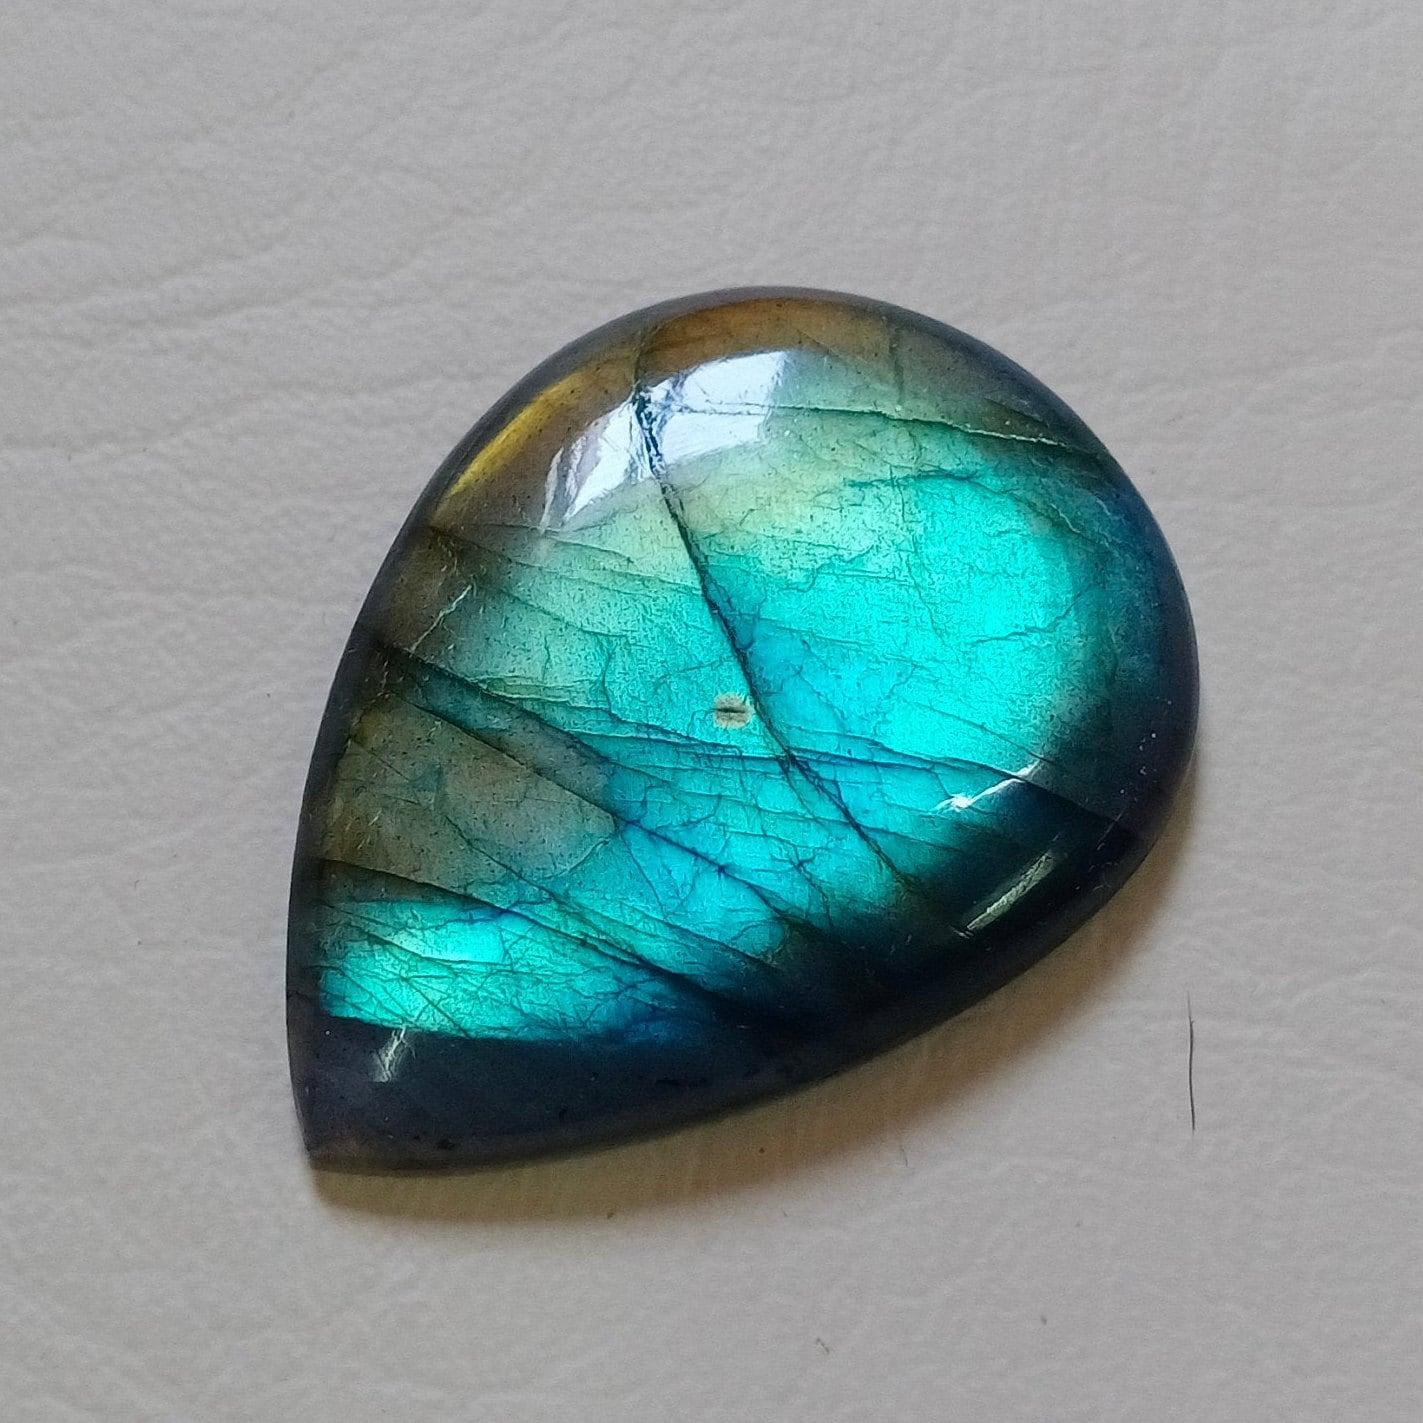 Natural Rare Multi Fire Labradorite Gemstone AAA Quality Stone Pendant Jewelry Labradorite 34X25X7 mm 54 Crt Natural Stone